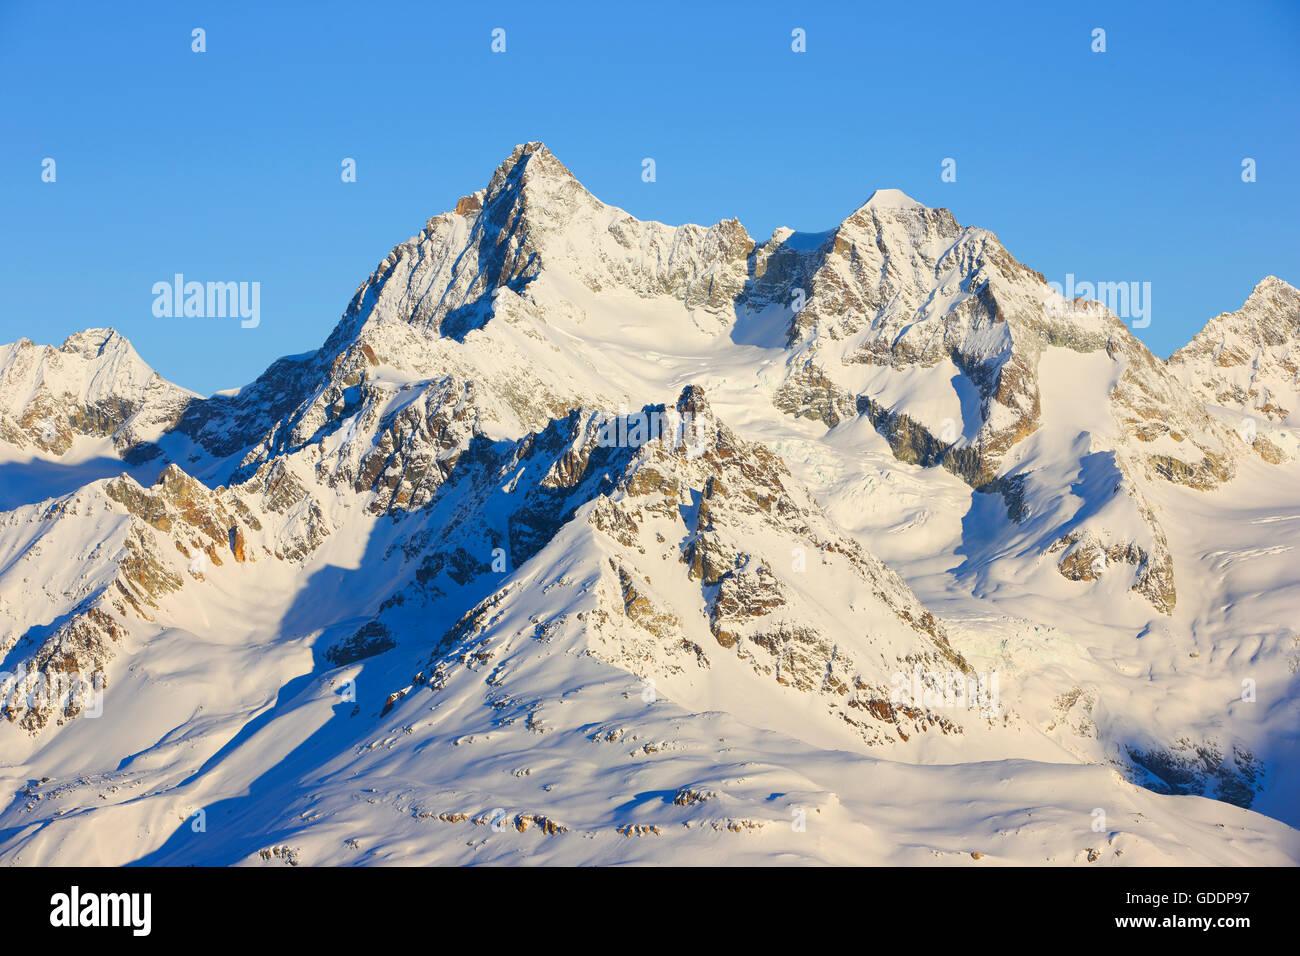 Ober Gabelhorn - 4063 ms,Valais,Switzerland Stock Photo